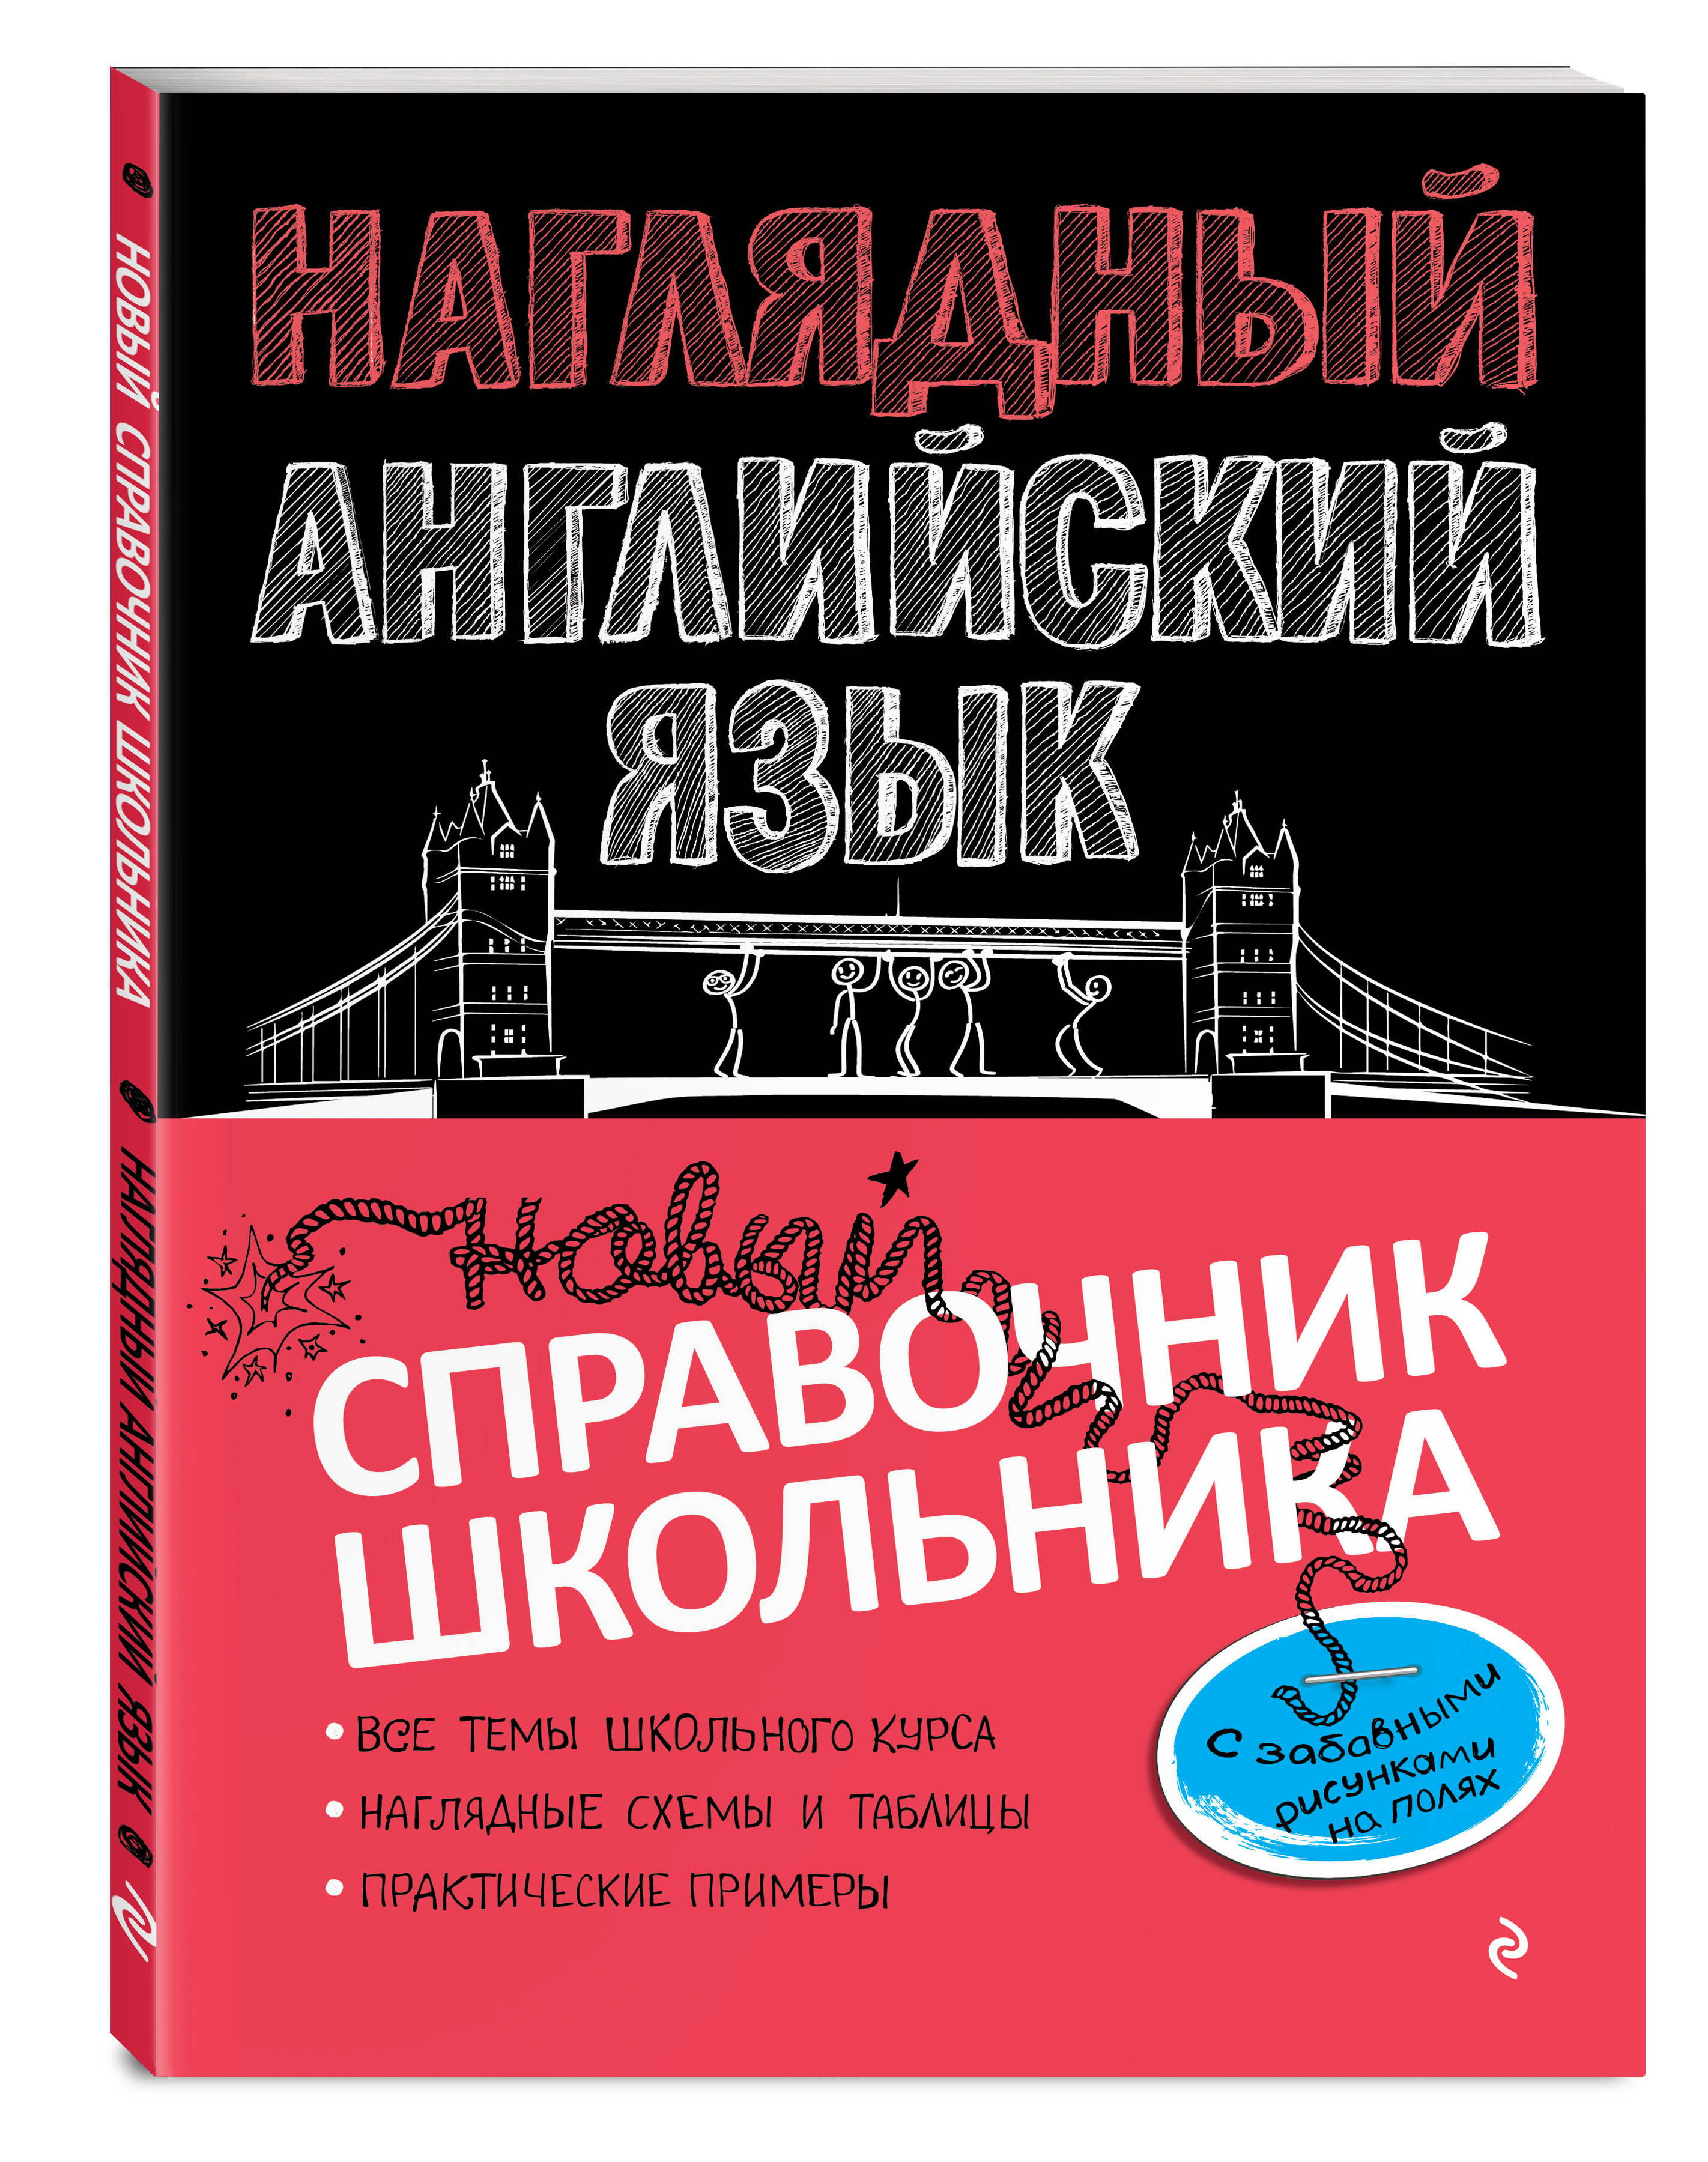 Наглядный английский язык ( Логвина Анна Александровна  )